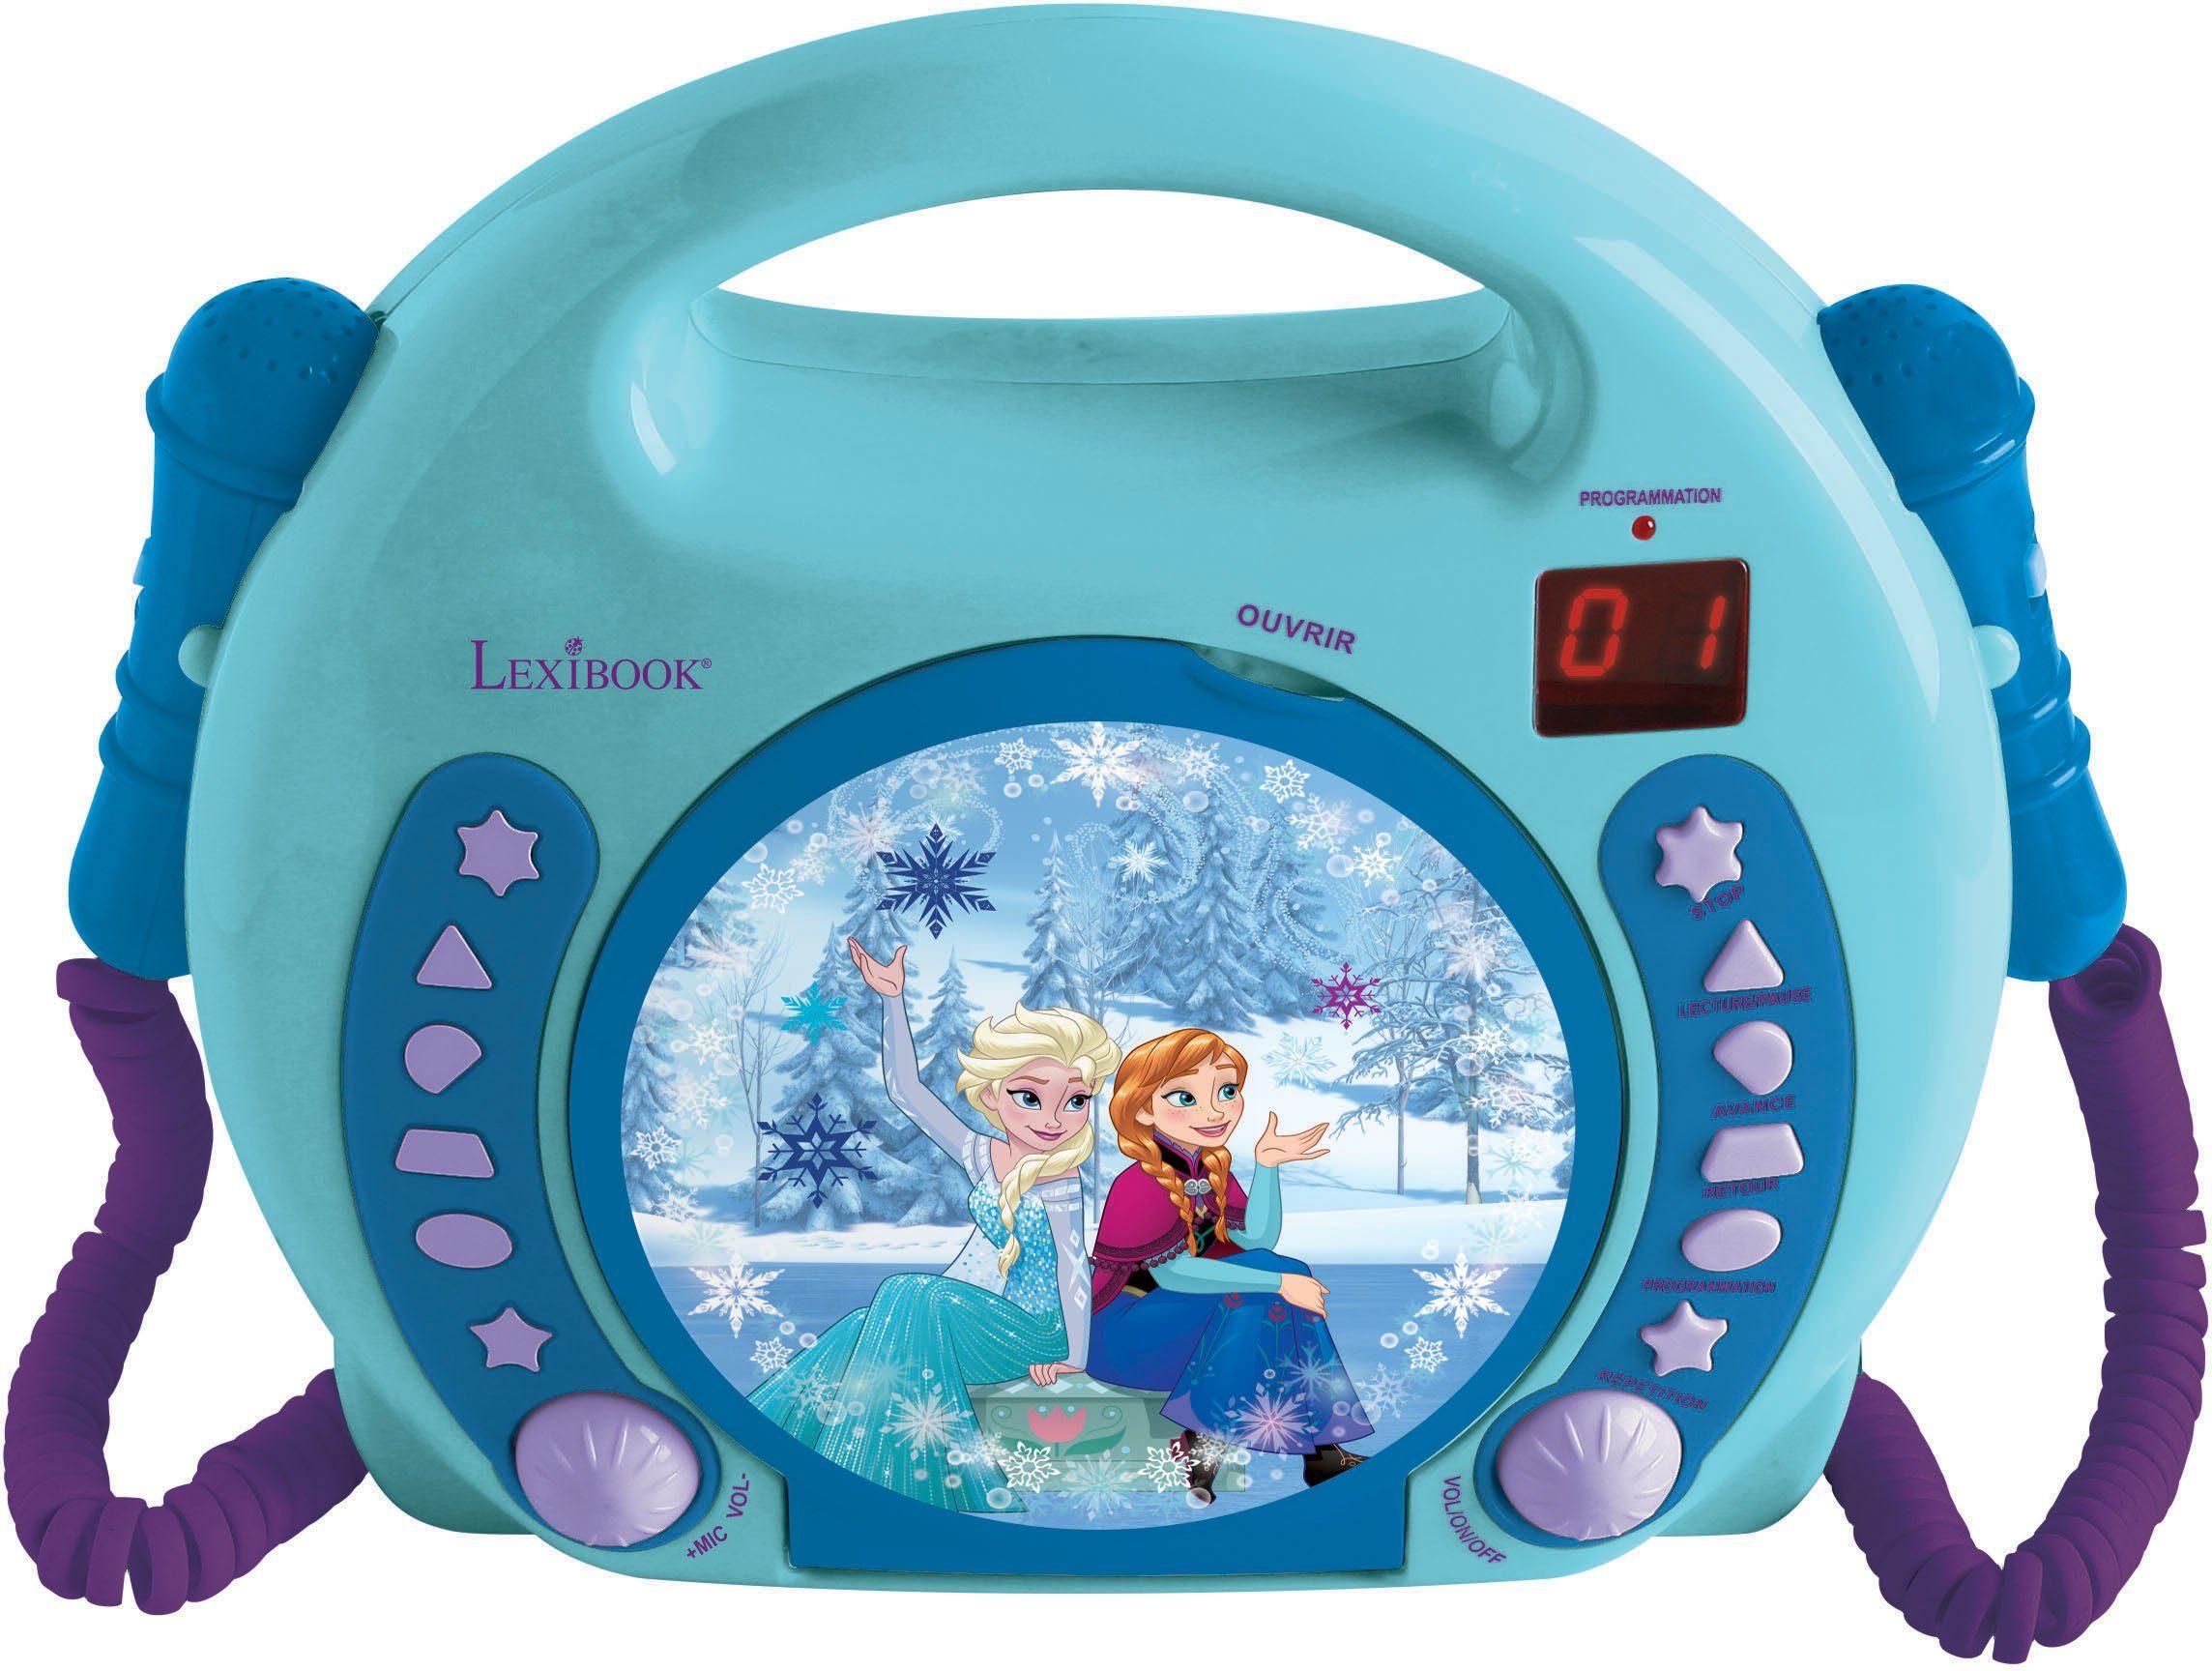 Lexibook, Kinder Karaoke CD Player mit 2 Mikrofonen, »Disney Pixar Frozen«